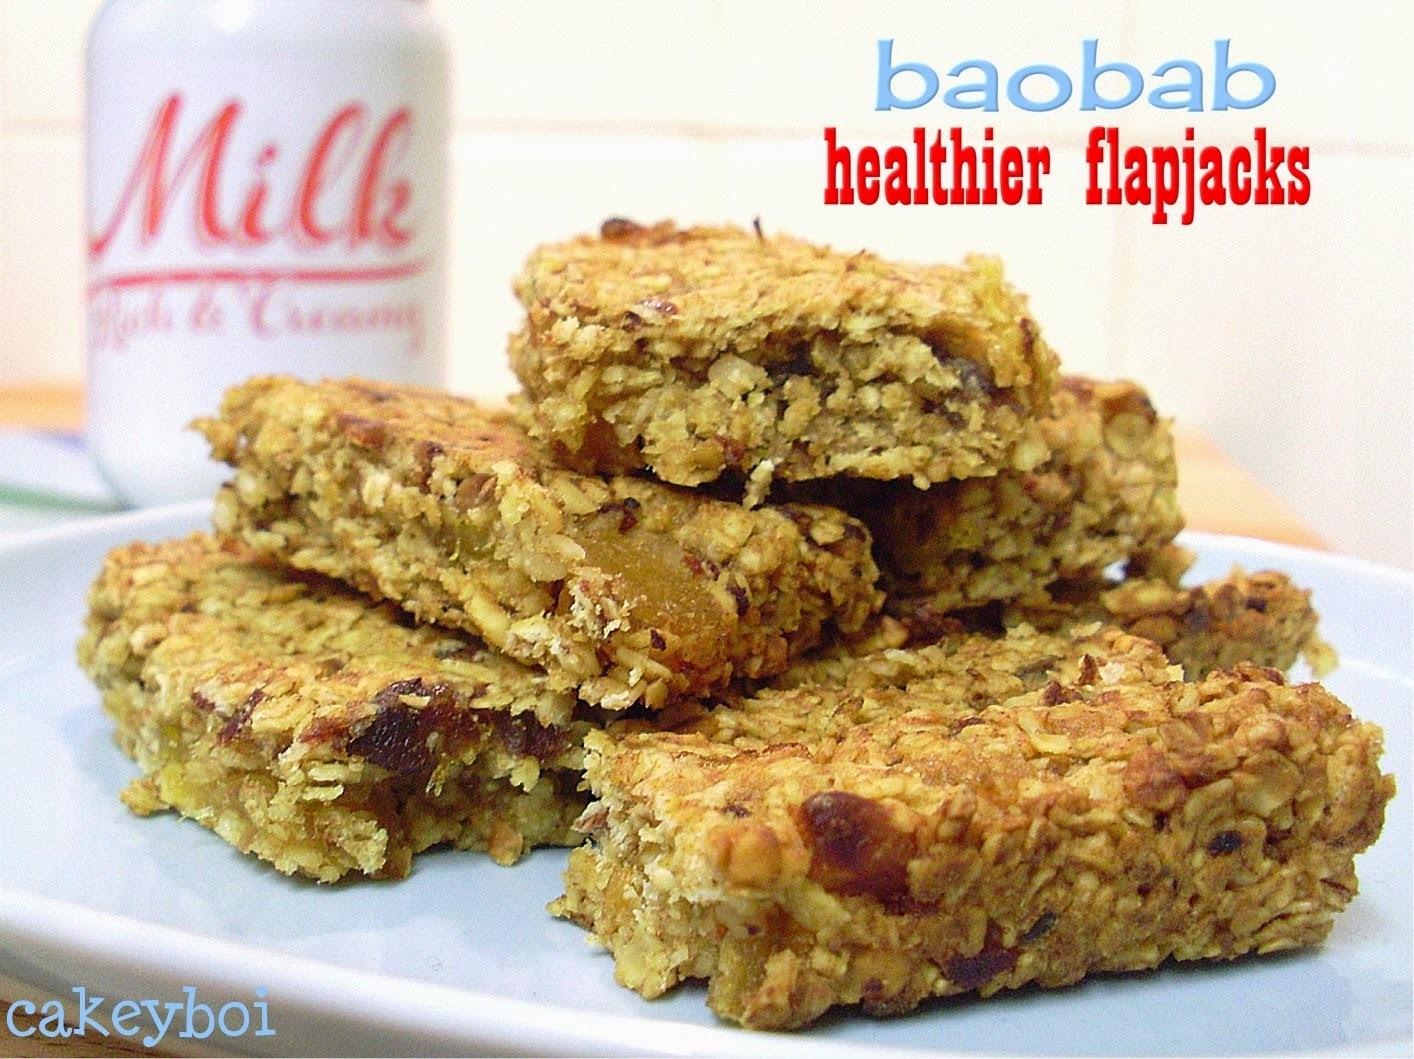 Healthier Flapjacks with added Baobab